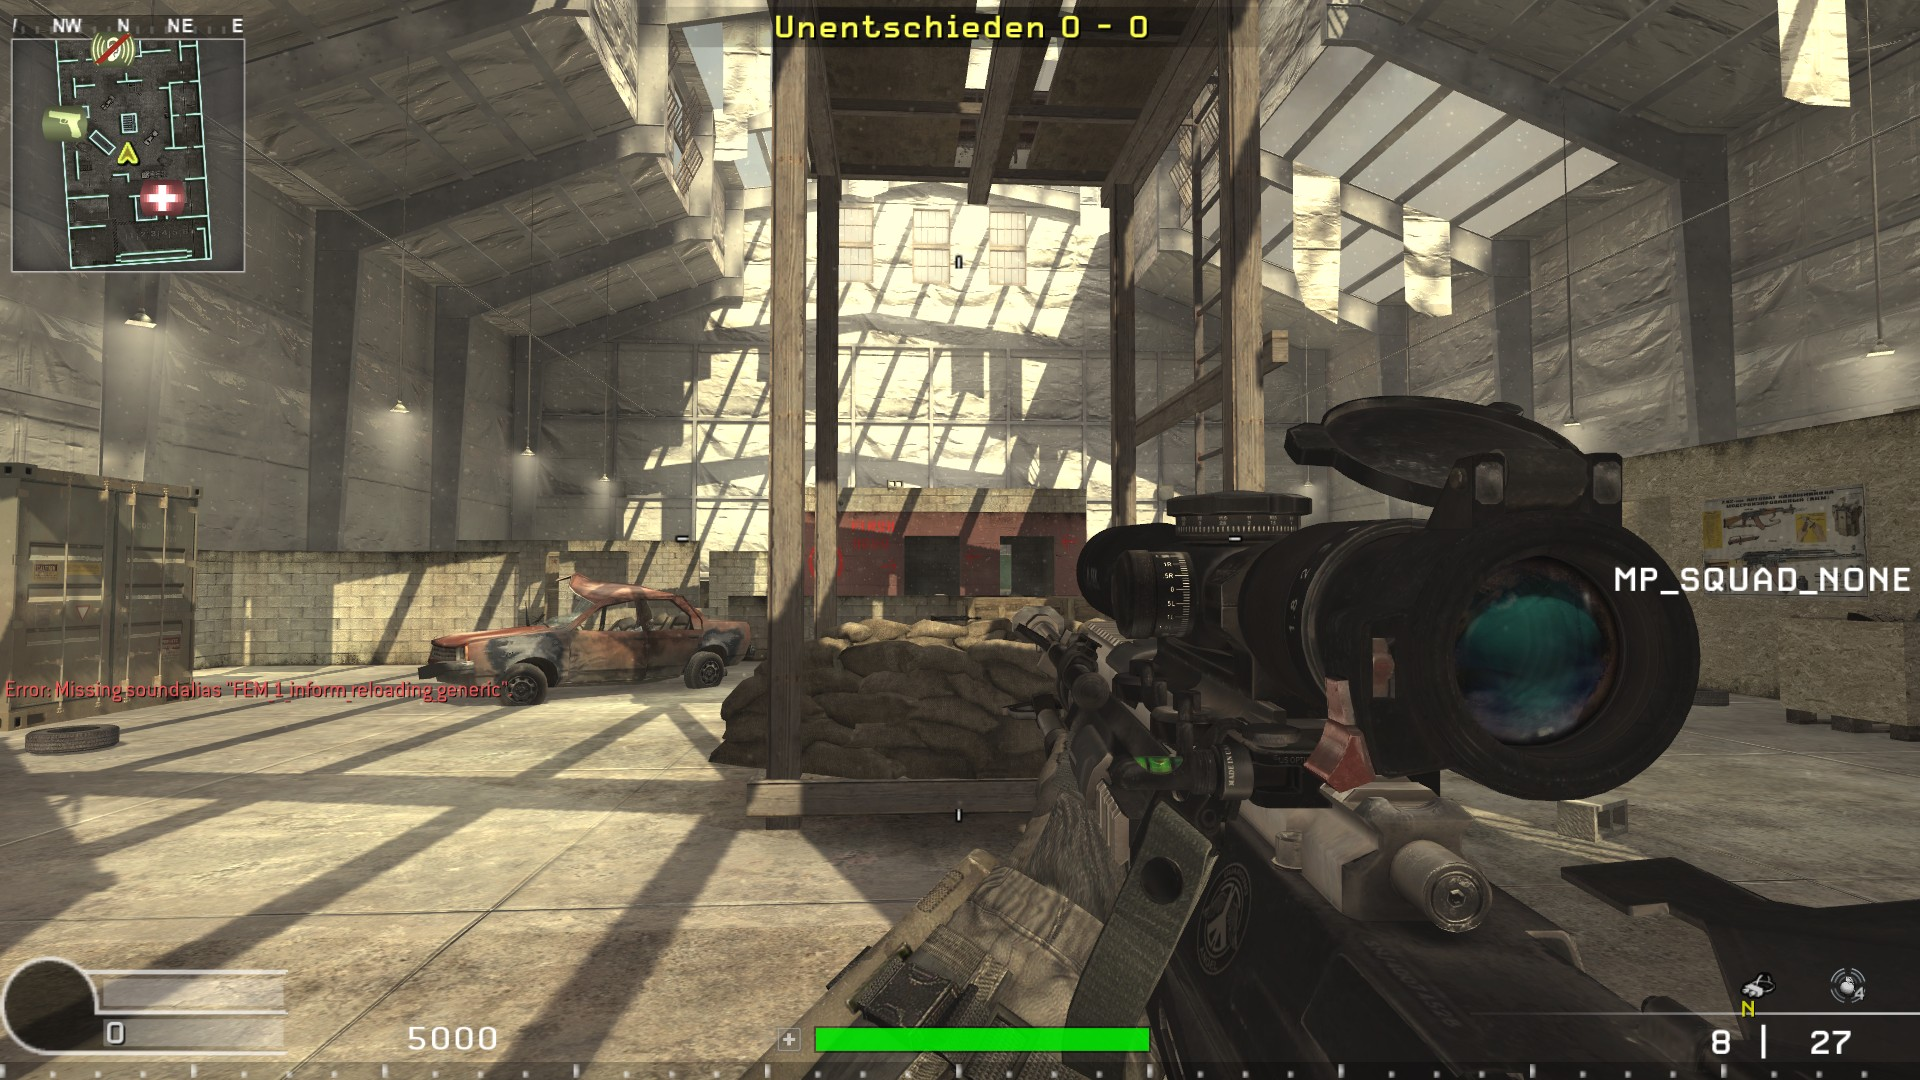 RoZo GM6 Lynx Image RoZo Return Of Zombie Ops Mod For Call Of Duty 4 Modern Warfare Mod DB